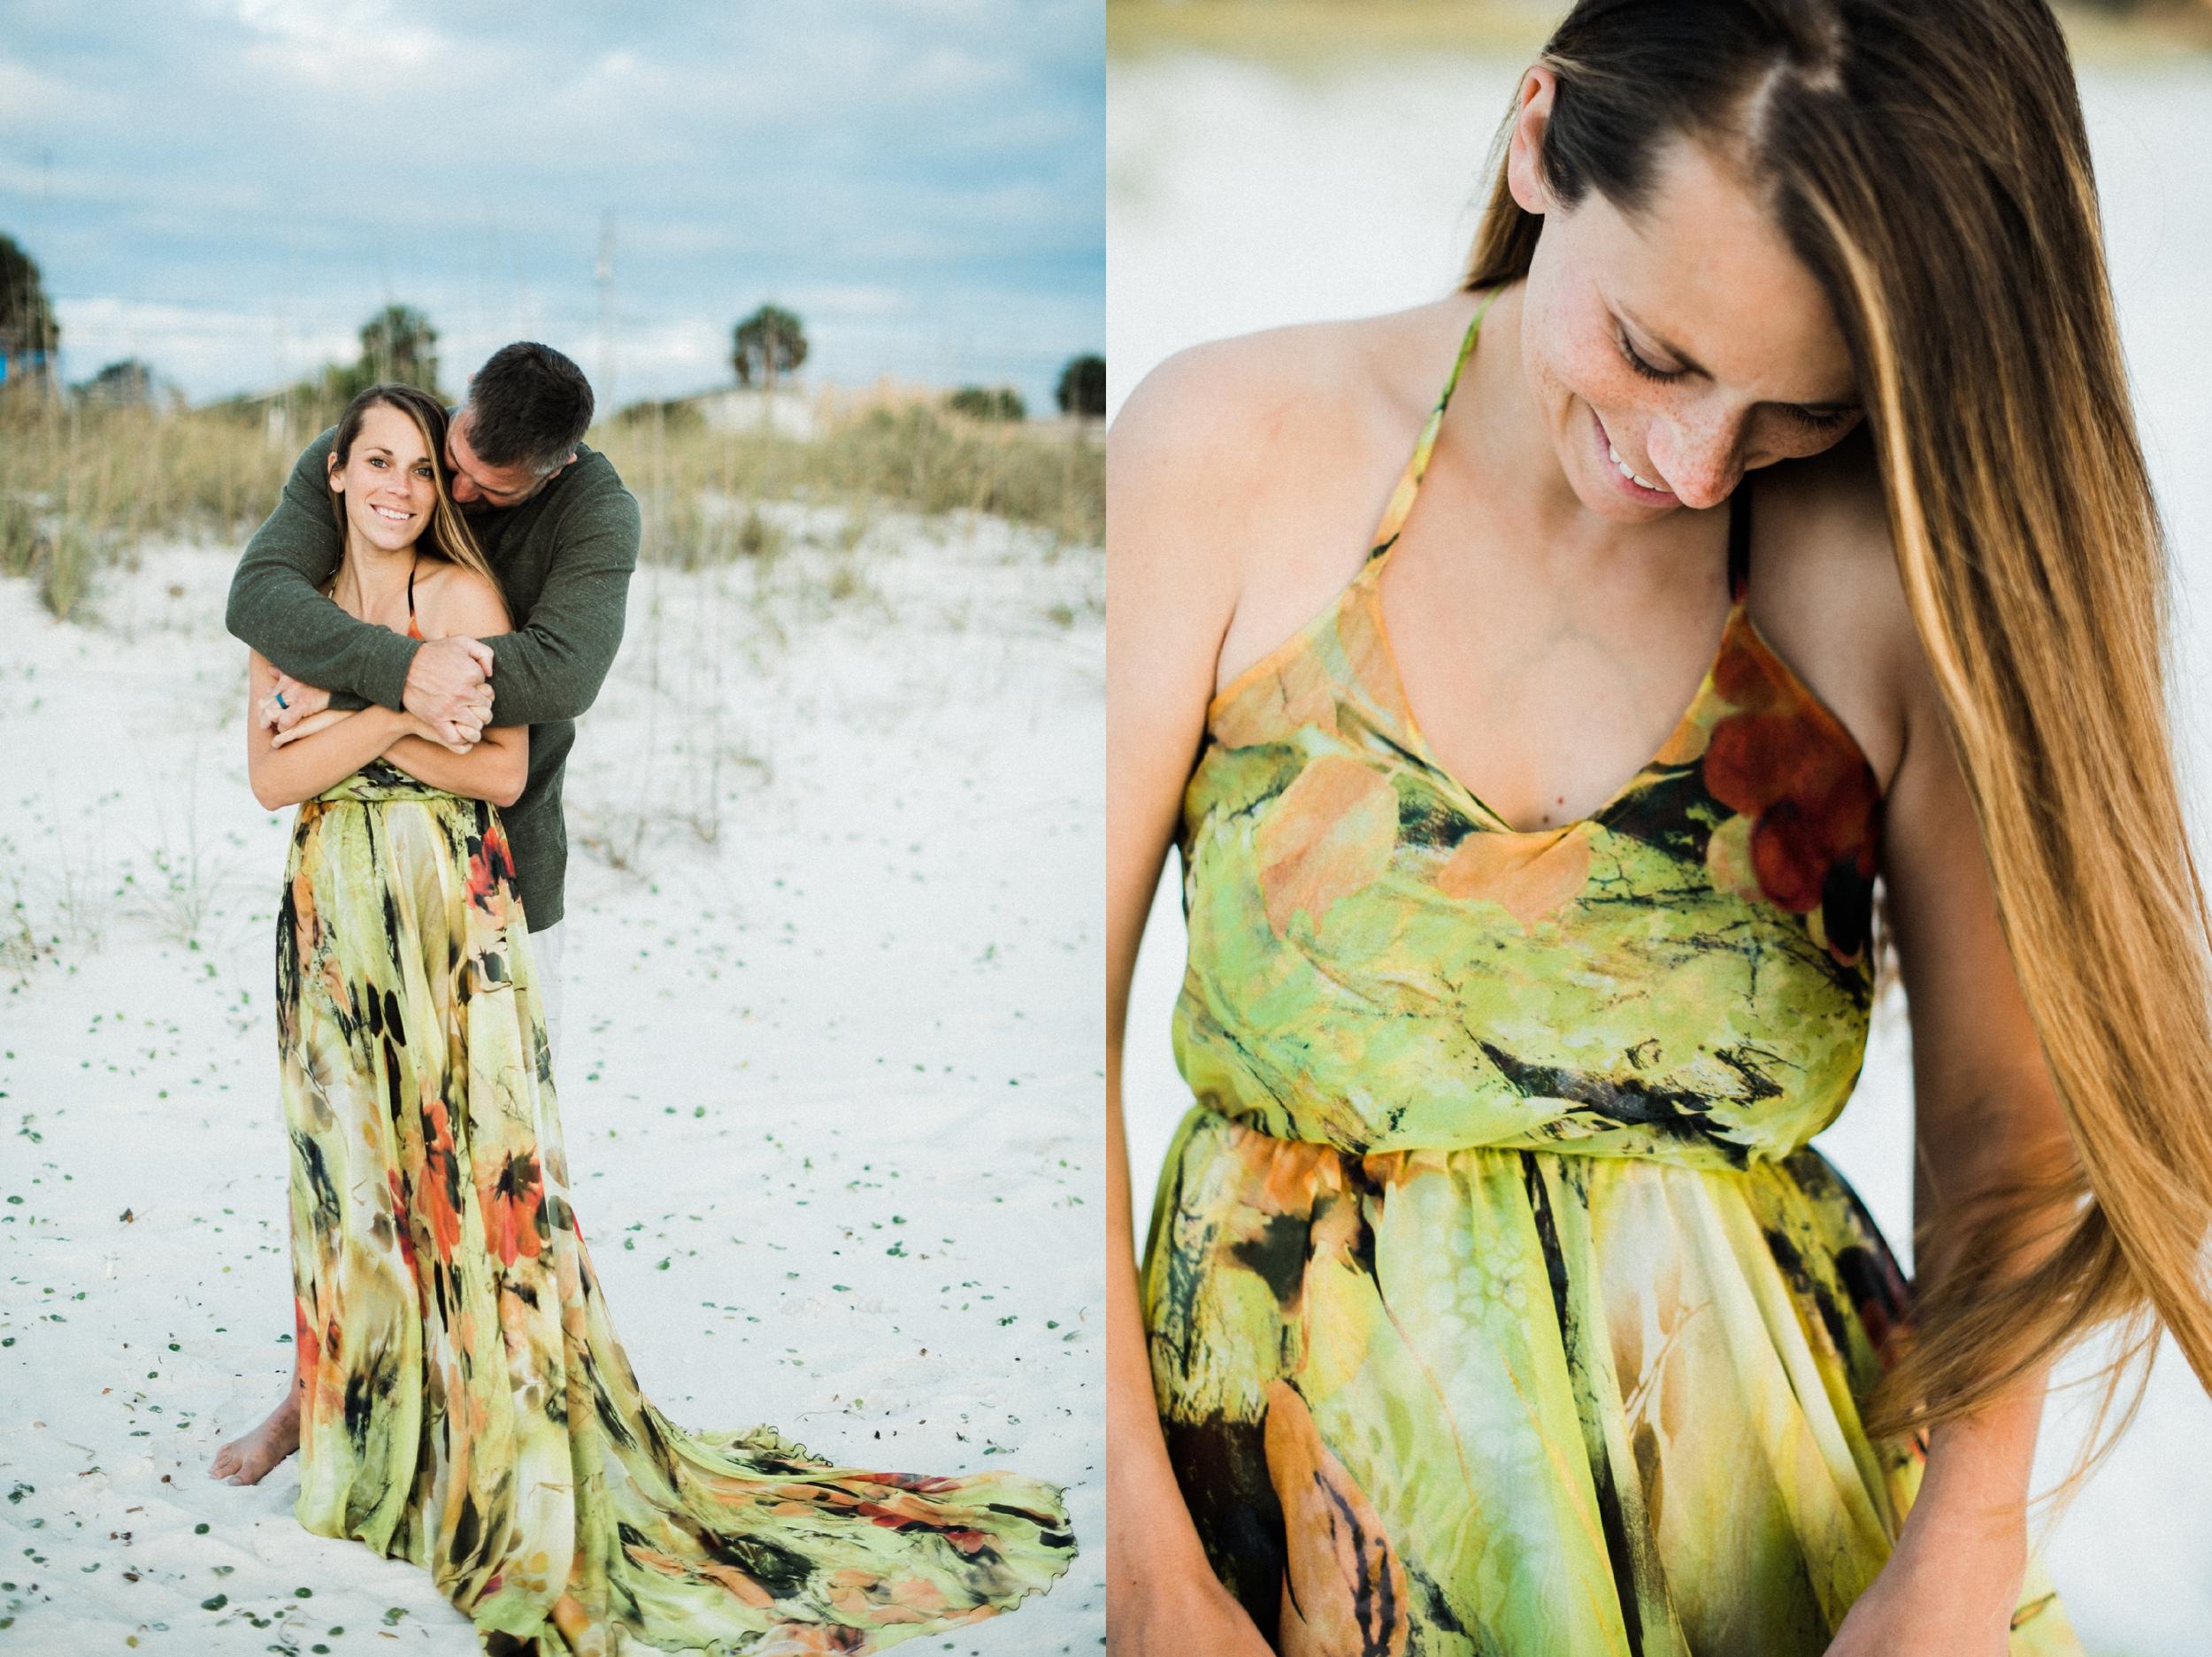 desiree-gardner-photography-pairs-france-monet-garden-monets-couple-wedding-engagement-giverny-30-a-30a-florida_0072.jpg